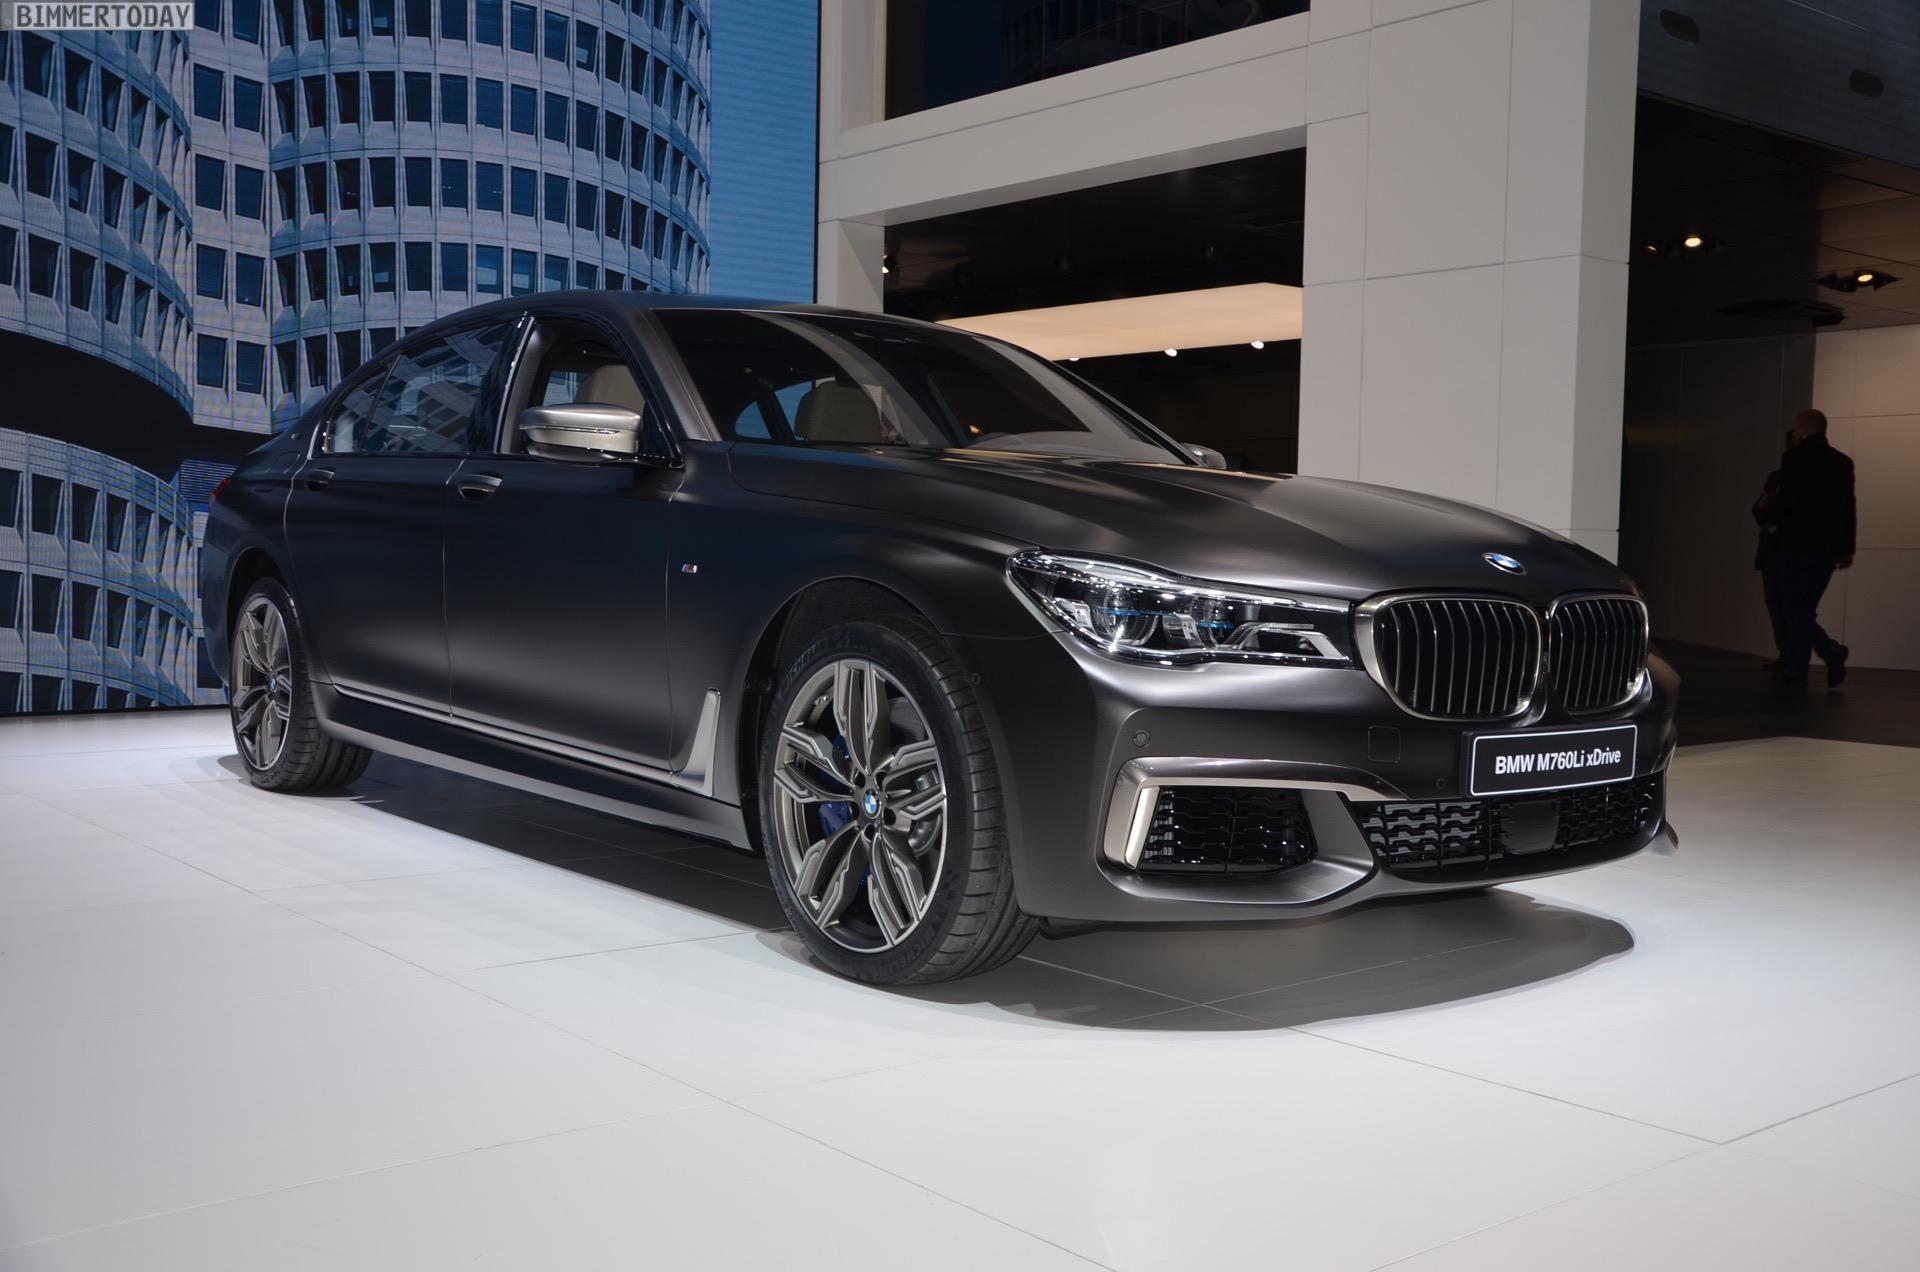 BMW M760Li G12 V12 xDrive 7er 2016 Frozen Dark Brown Genf Live 01